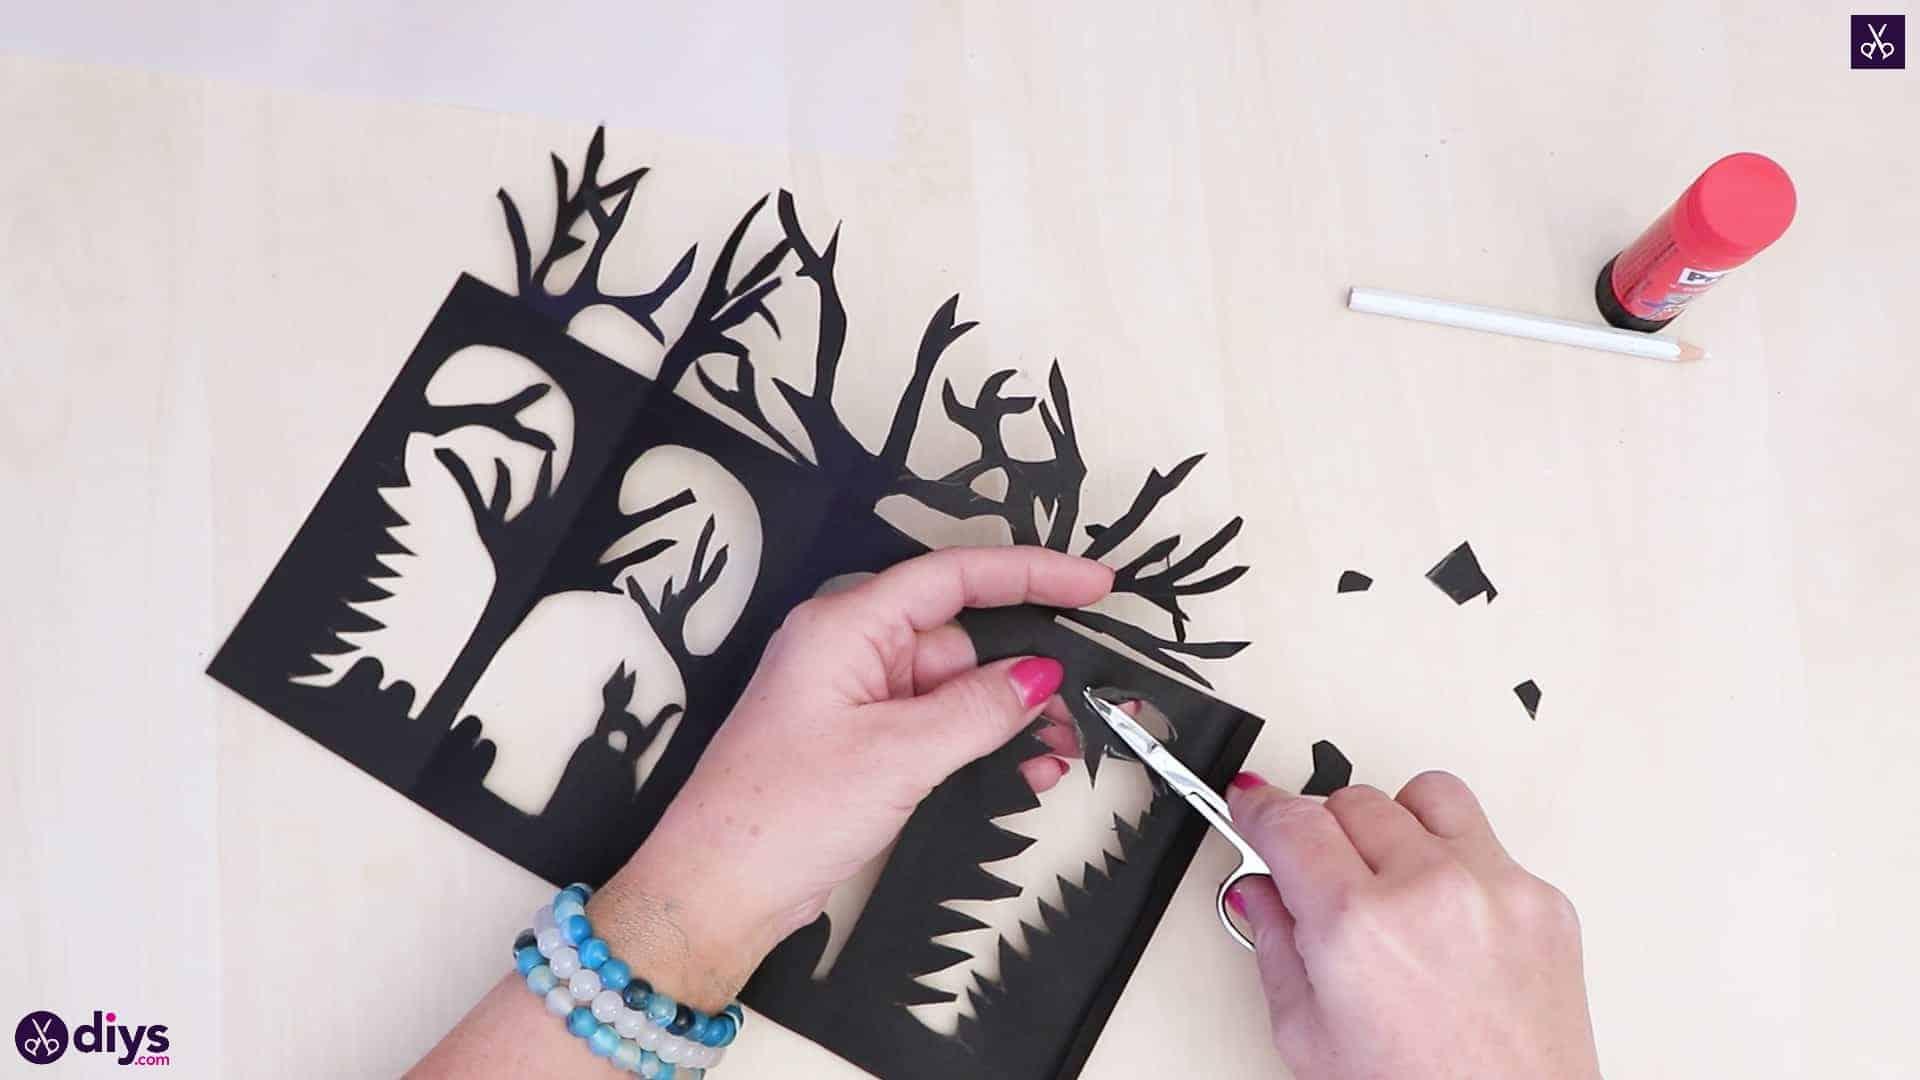 Diy paper lantern art step 4